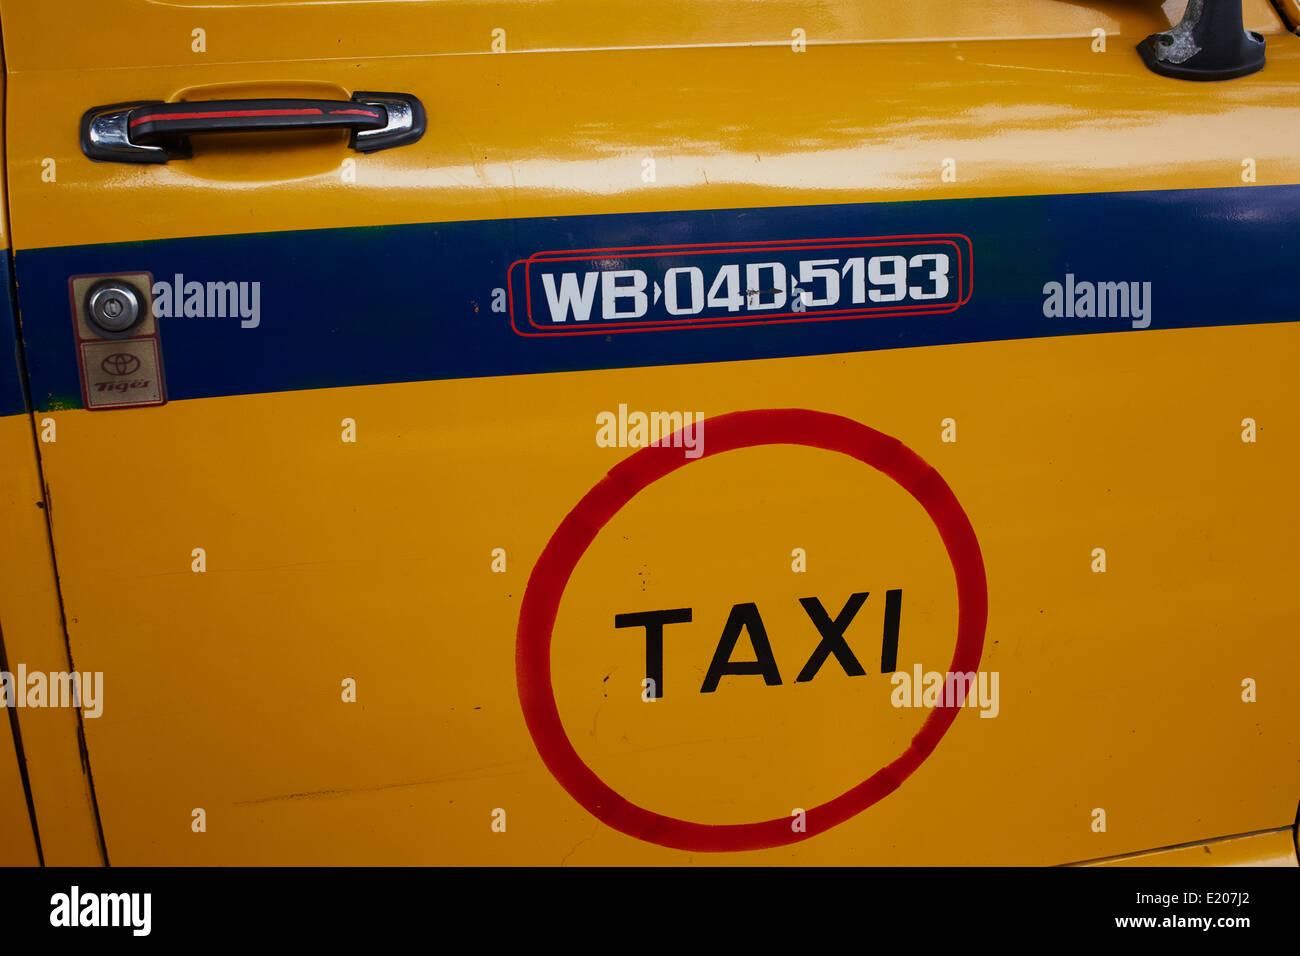 India, West Bengal, Kolkata, Calcutta, Yellow Ambassador taxis - Stock Image